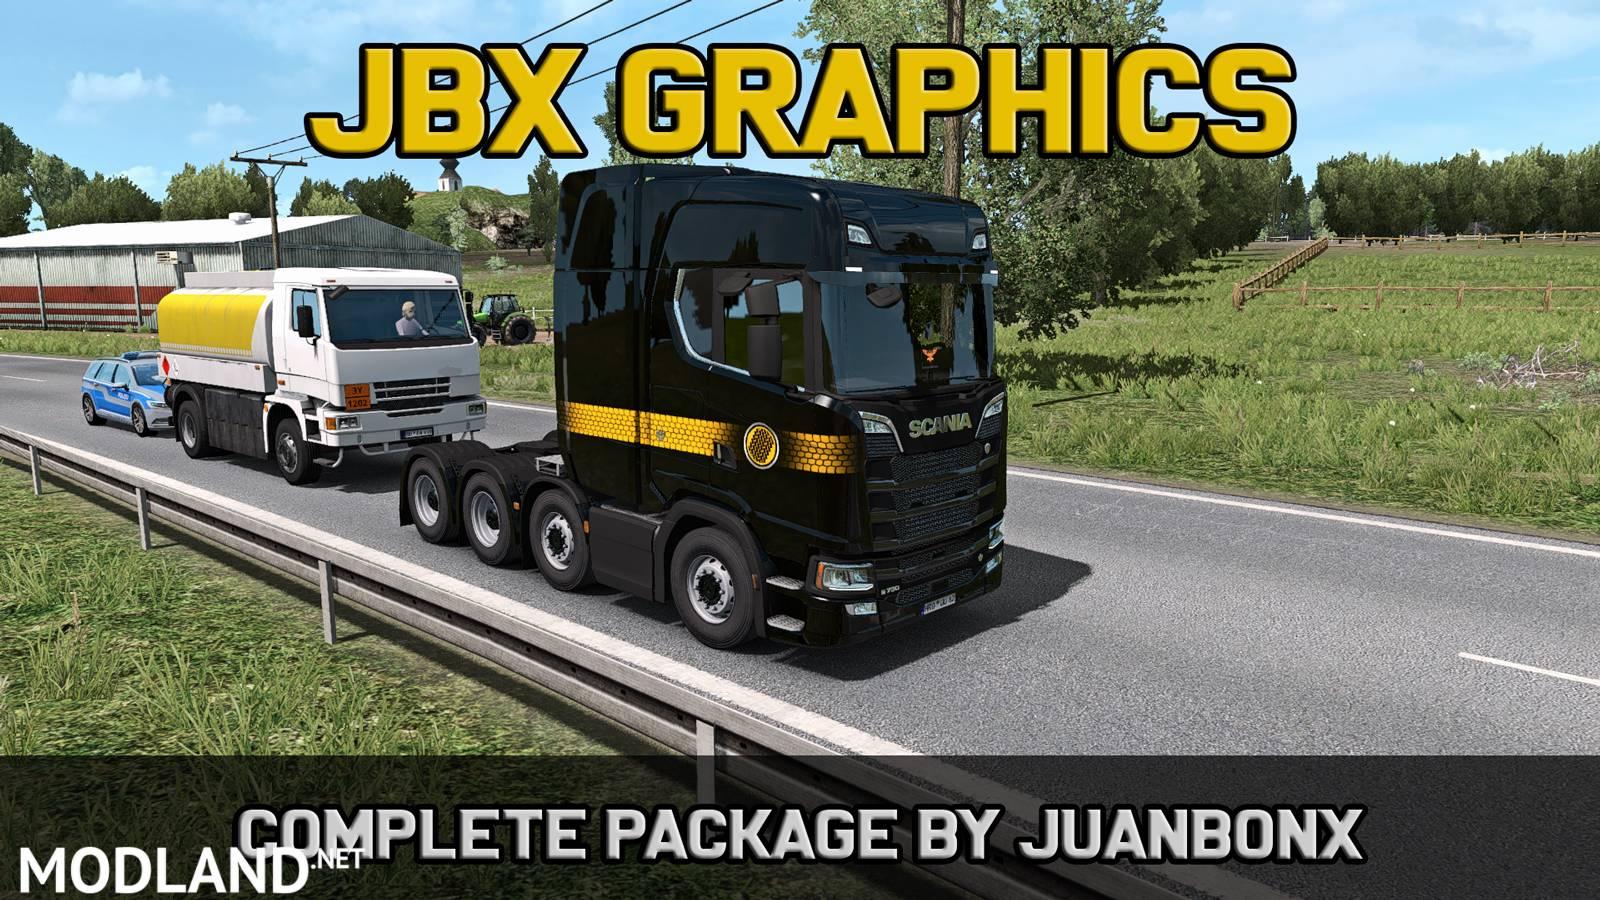 JBX Graphics - Complete Package (10-1-2019) mod for ETS 2